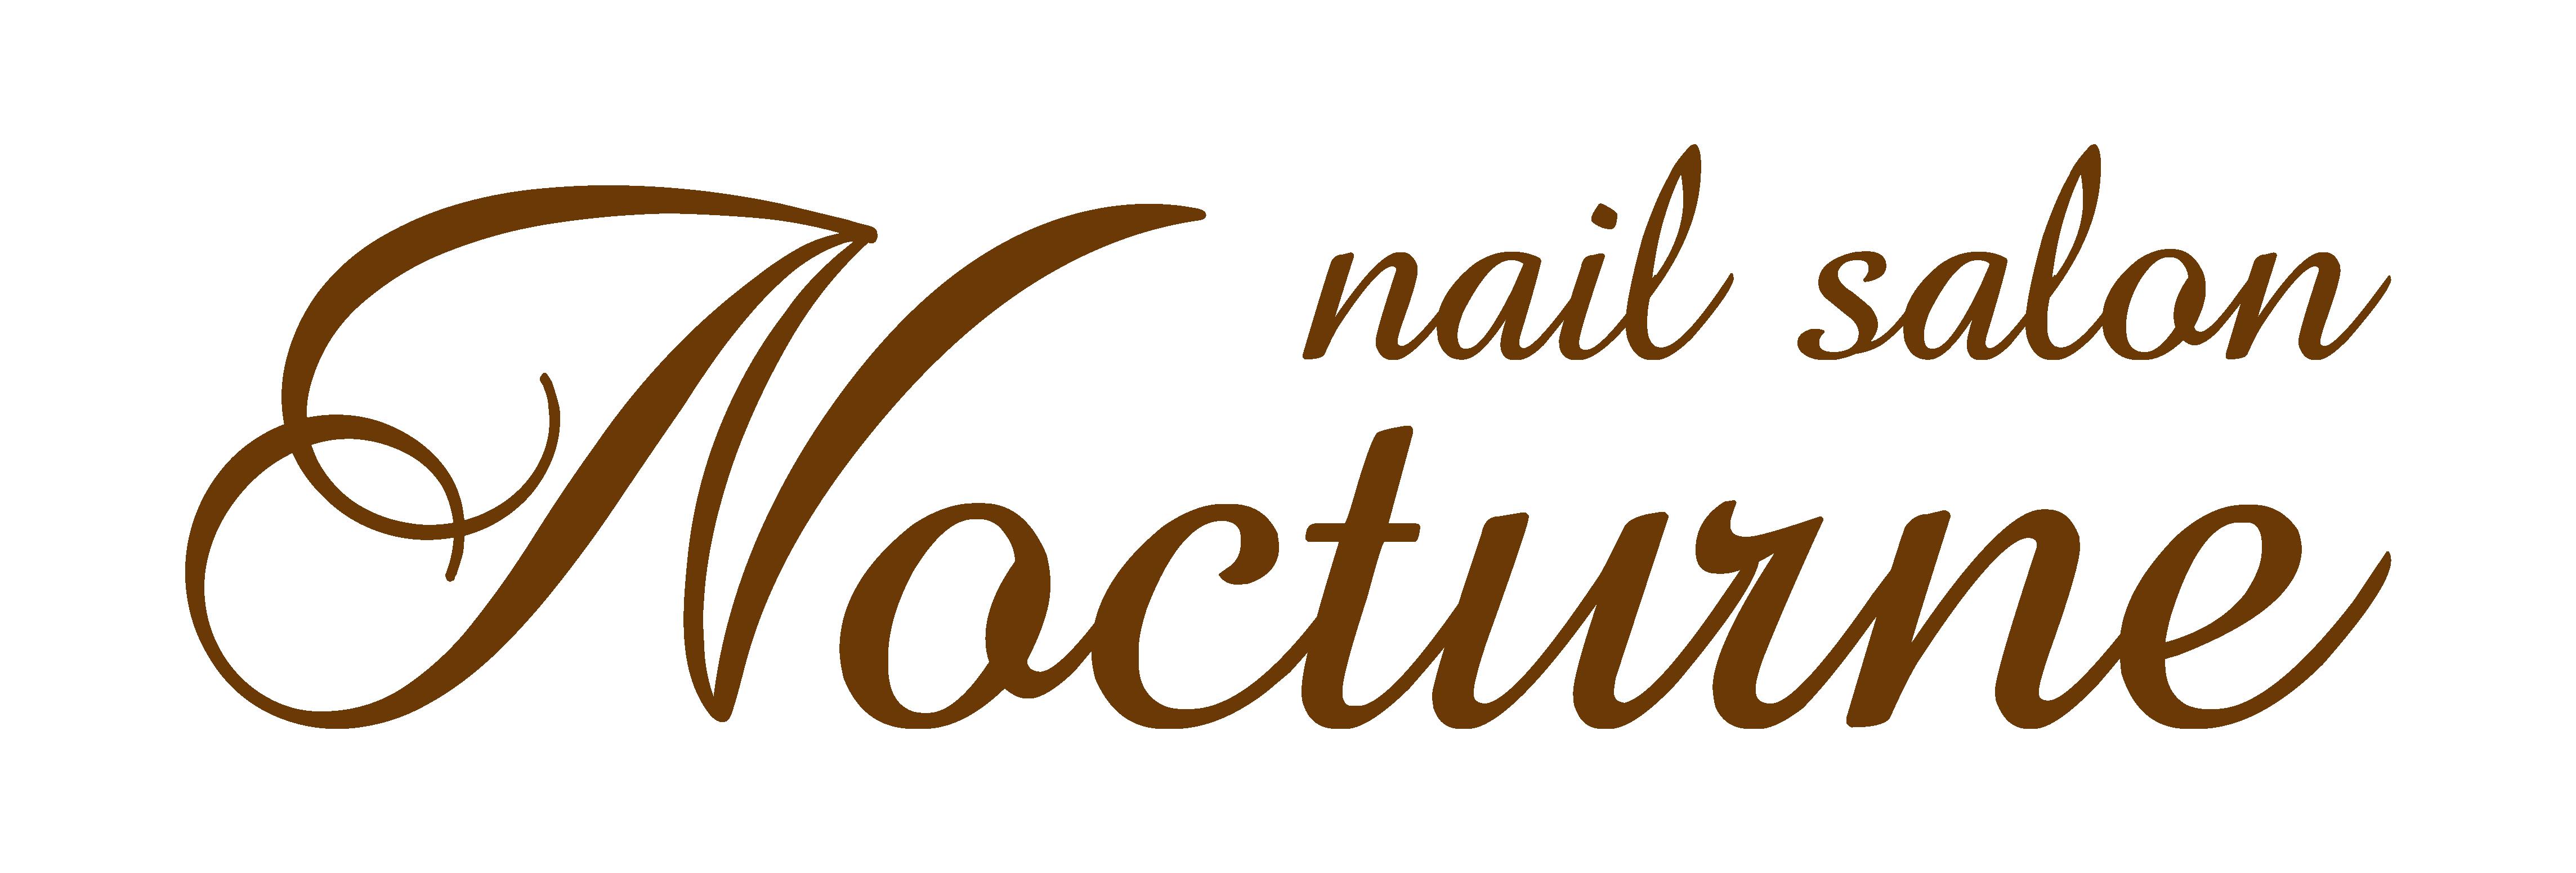 nail salon Nocturne【ノクターン】